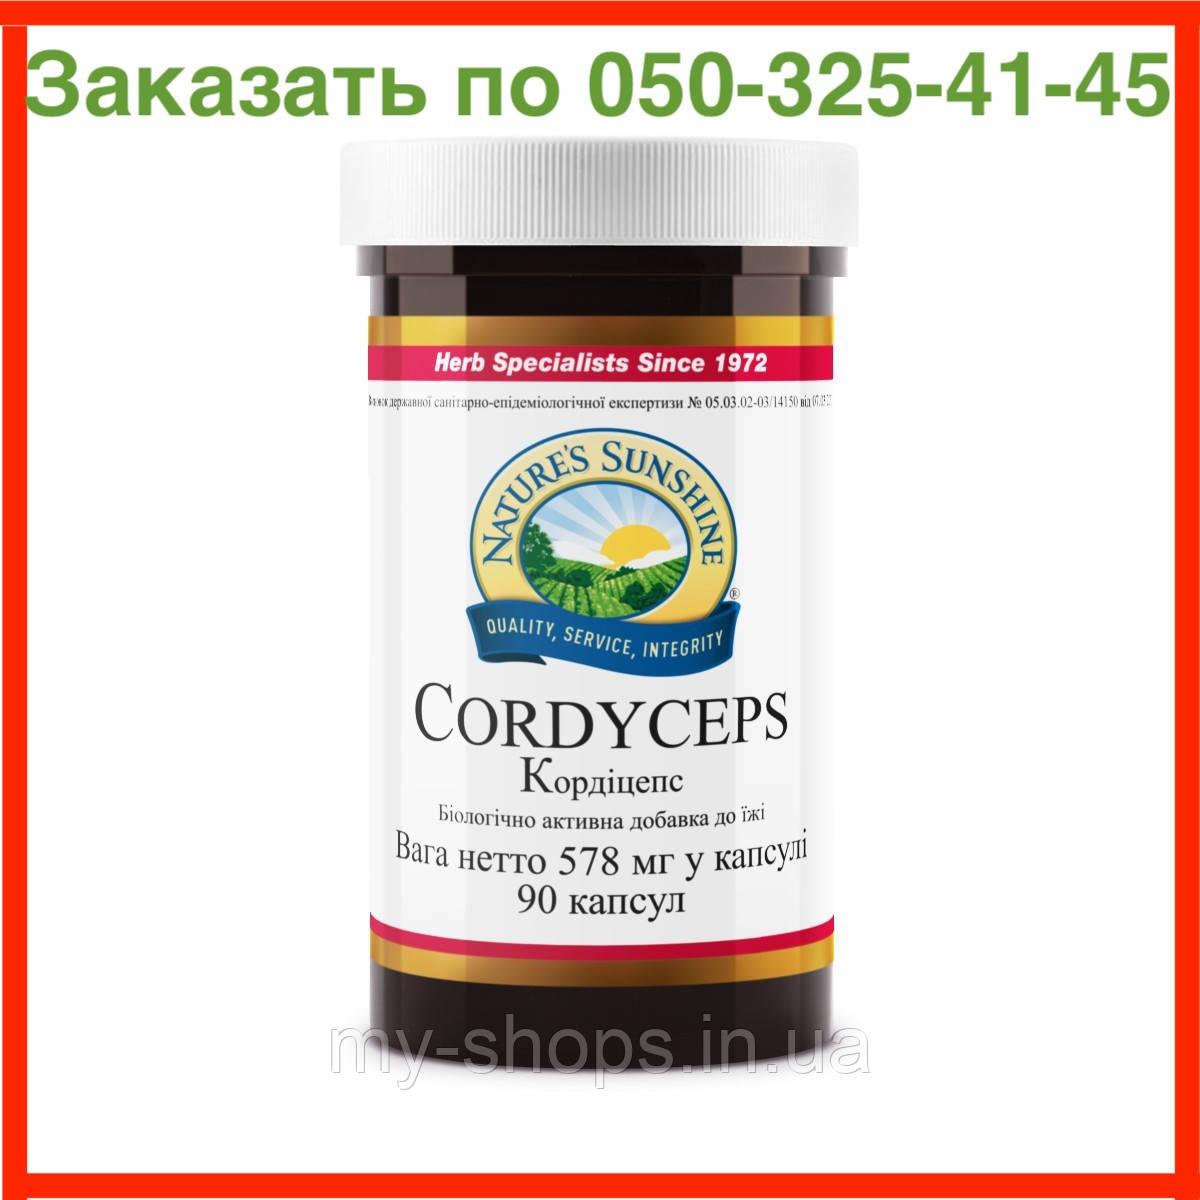 Cordyceps Кордицепс NSP. Натуральная БИОДОБАВКА